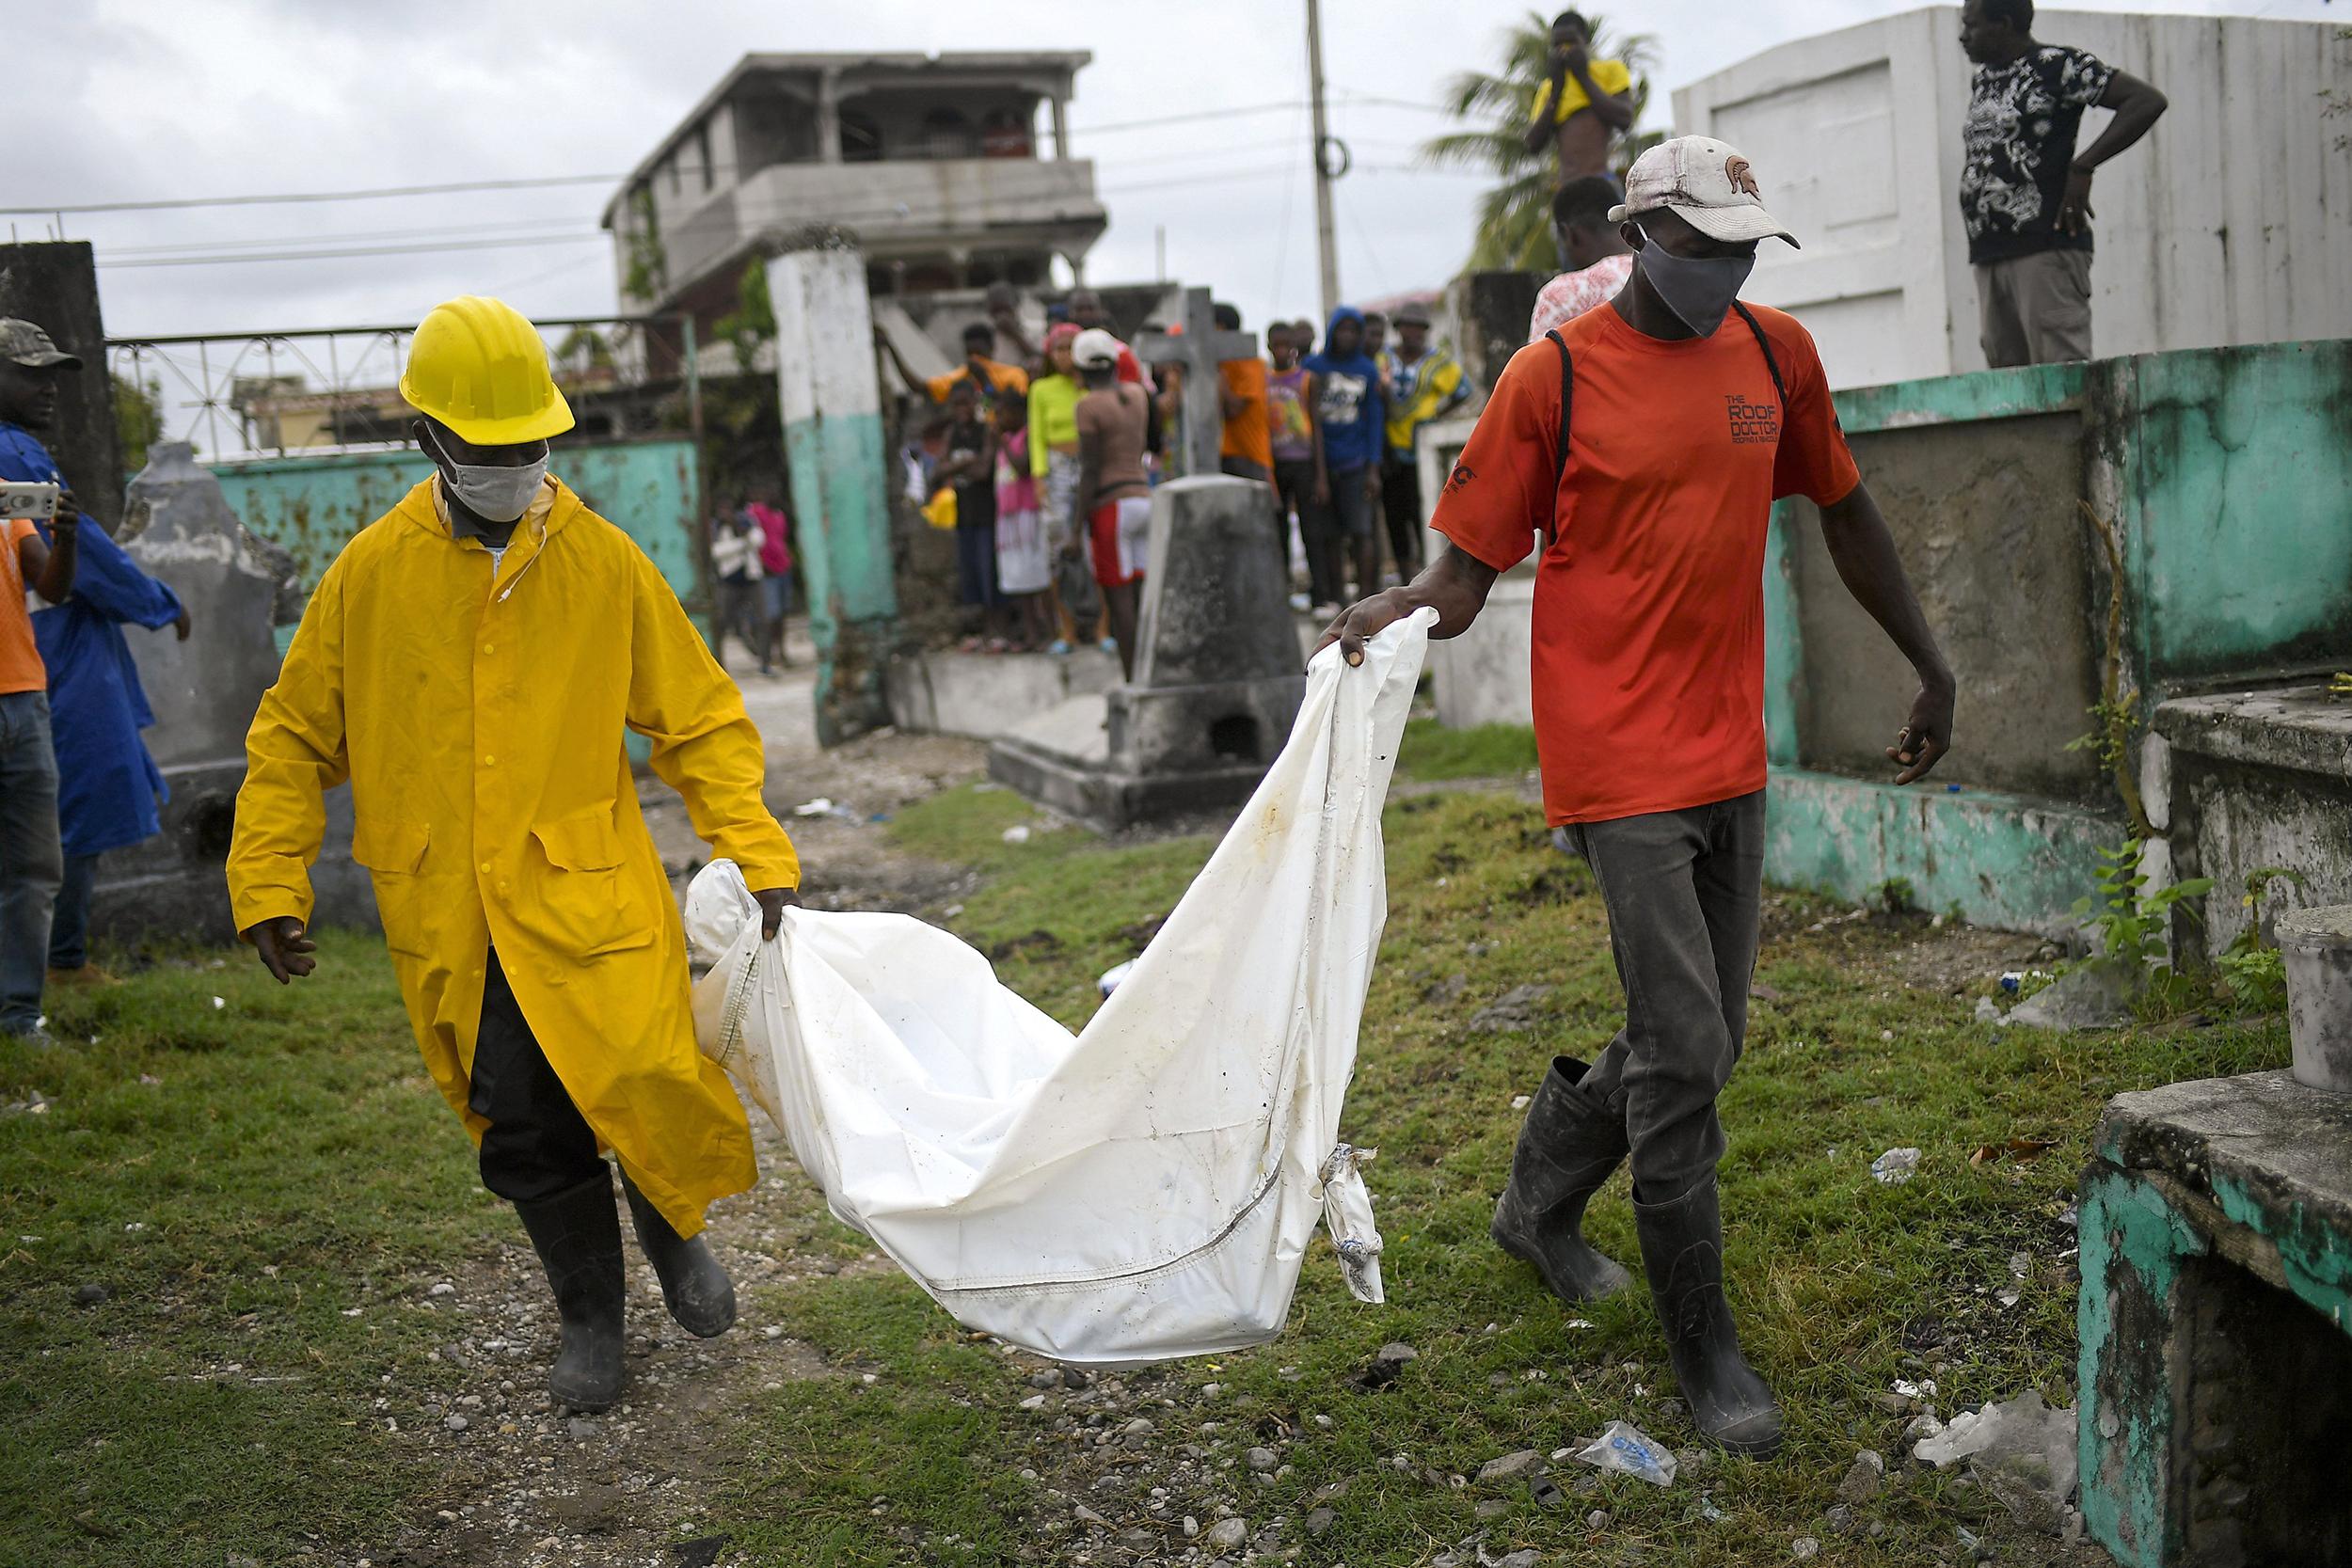 Death toll from Haiti earthquake climbs to 1,900